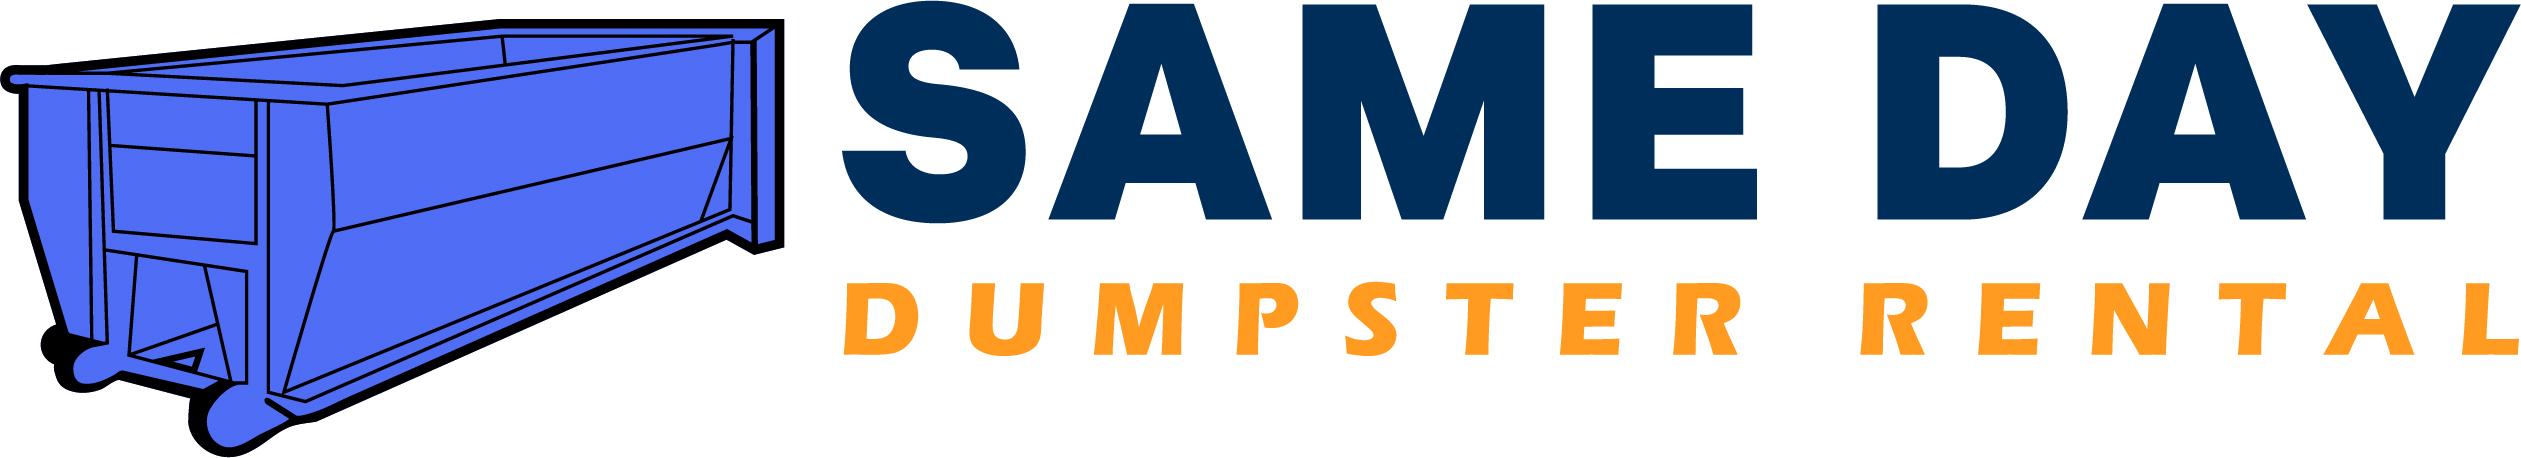 Same Day Dumpster Rental Pensacola Inc – Garbage collection service